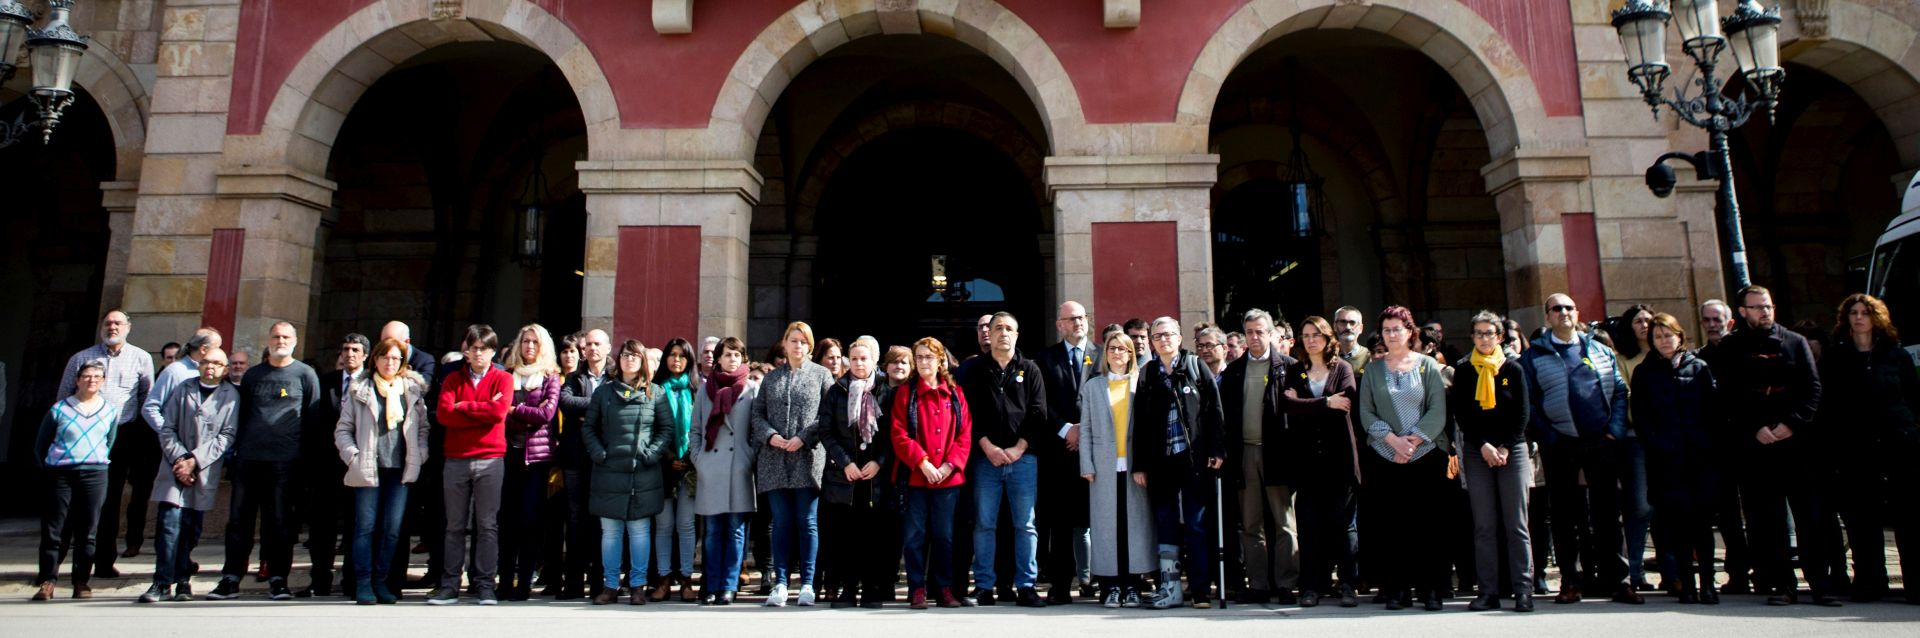 Madrid optužio zagovornike neovisnosti za nerede